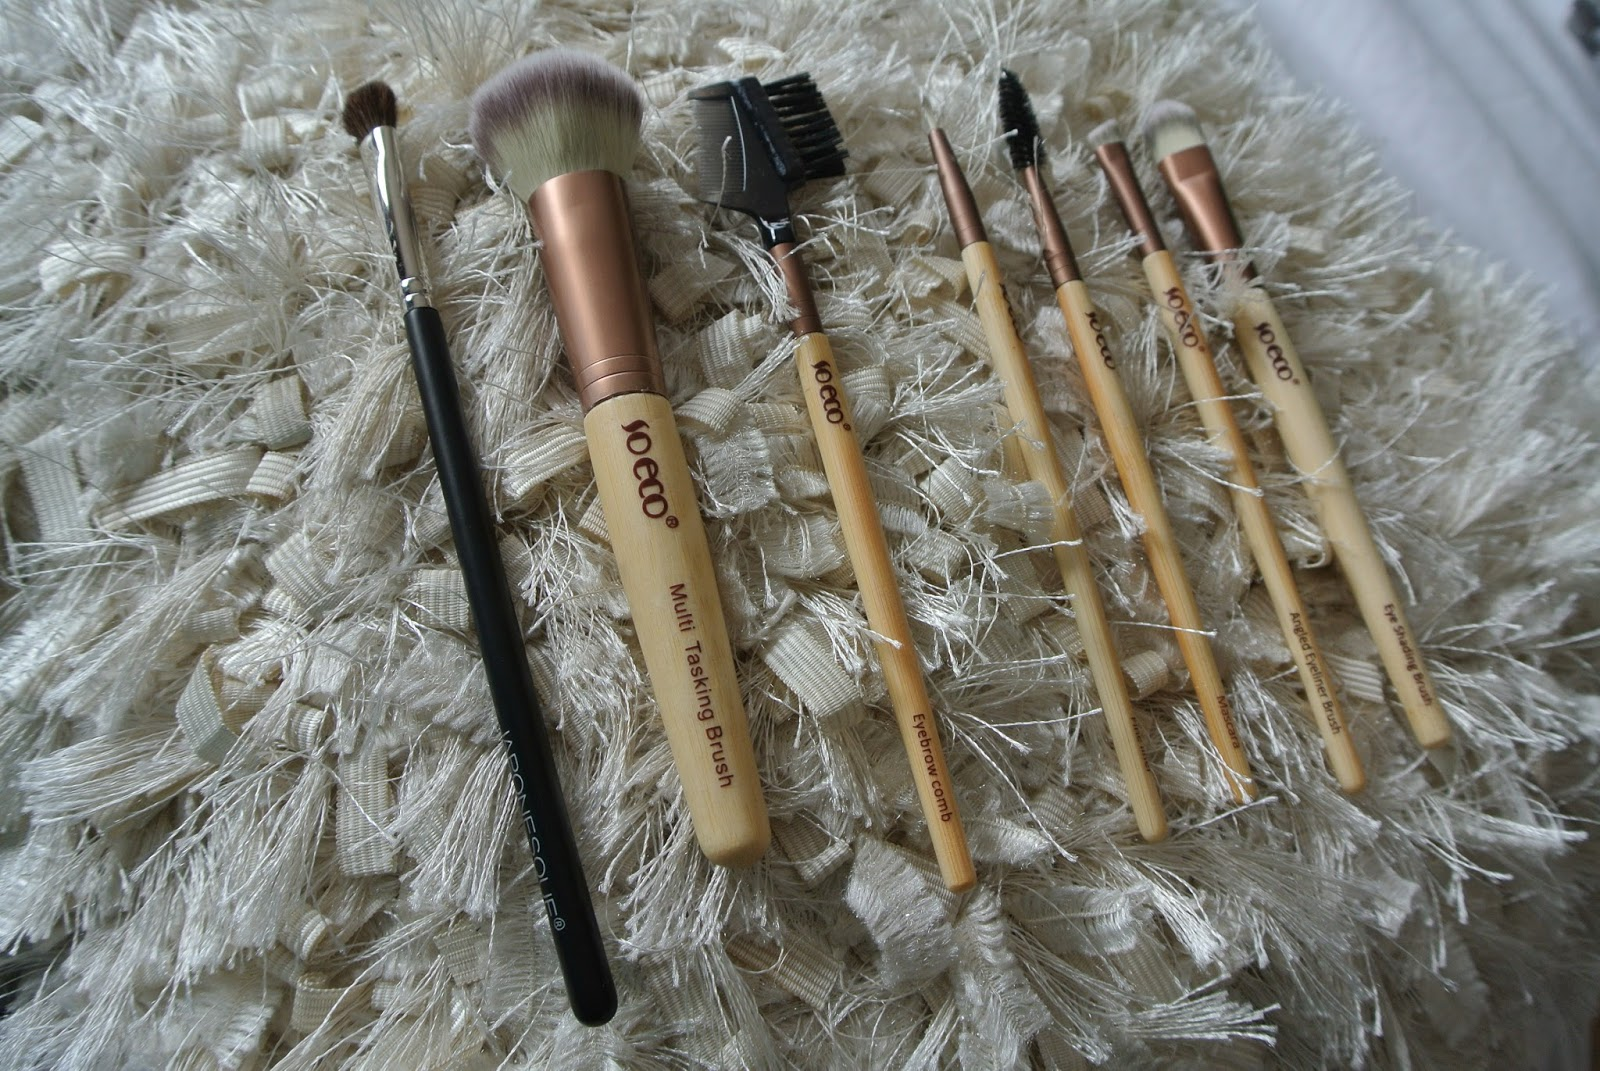 Japonesque & So Eco Makeup Brushes Makeupbrushes.co.uk